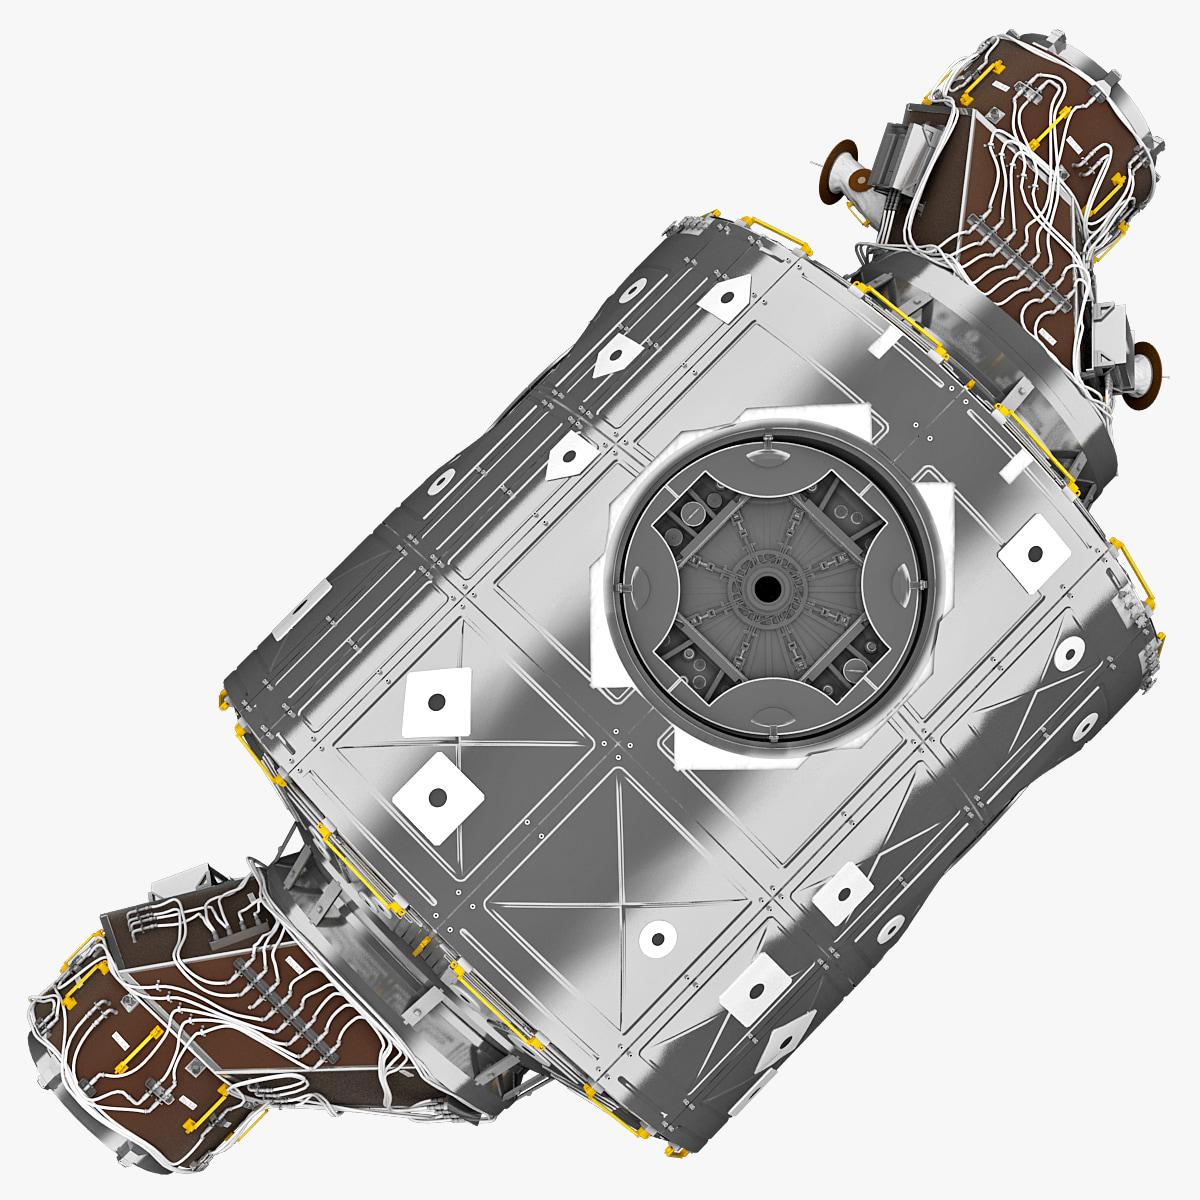 International_Space_Station_Unity_0002.jpg